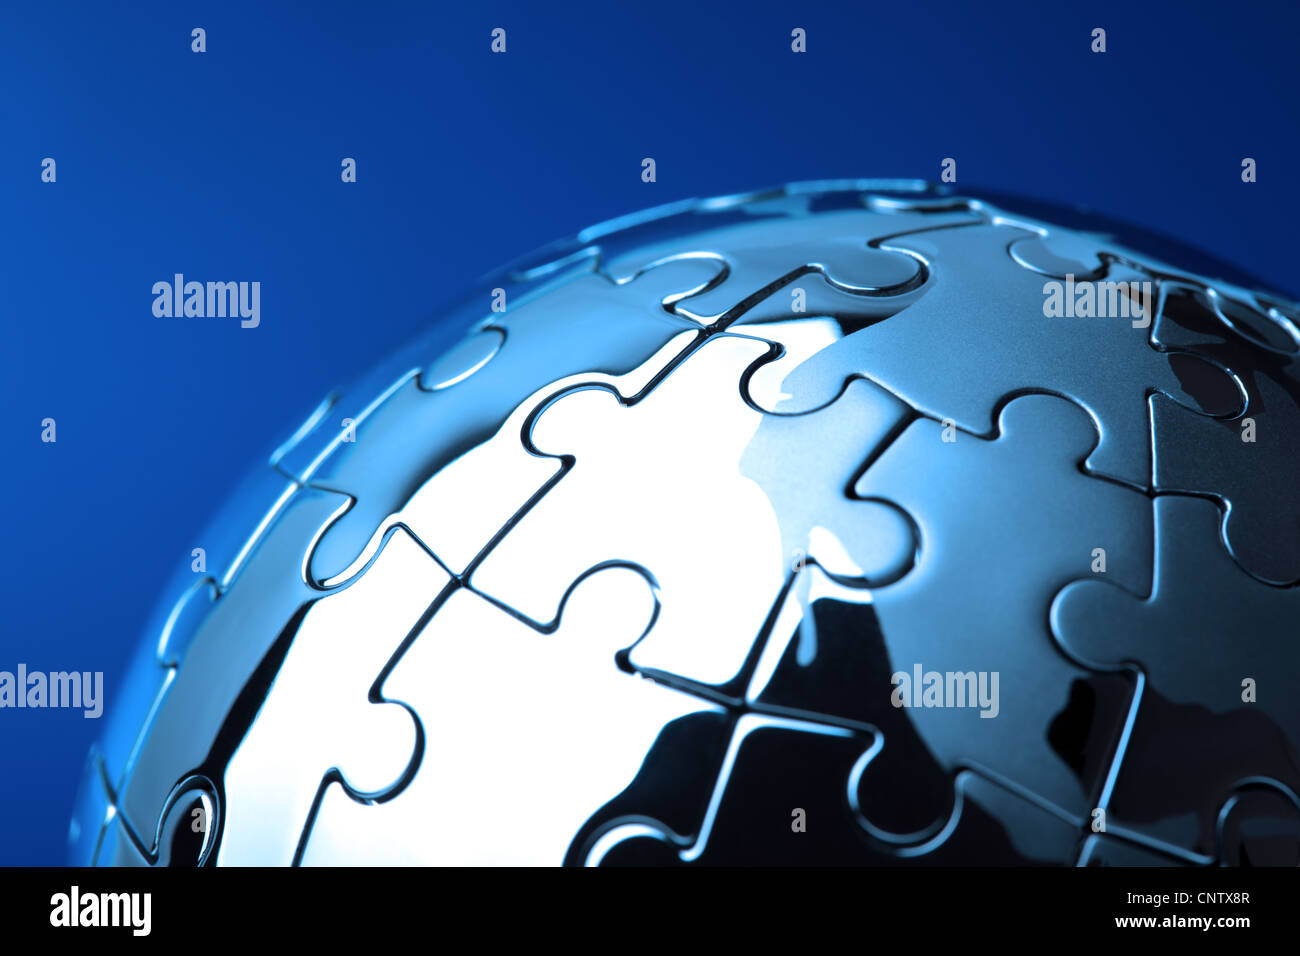 Global solution - Stock Image